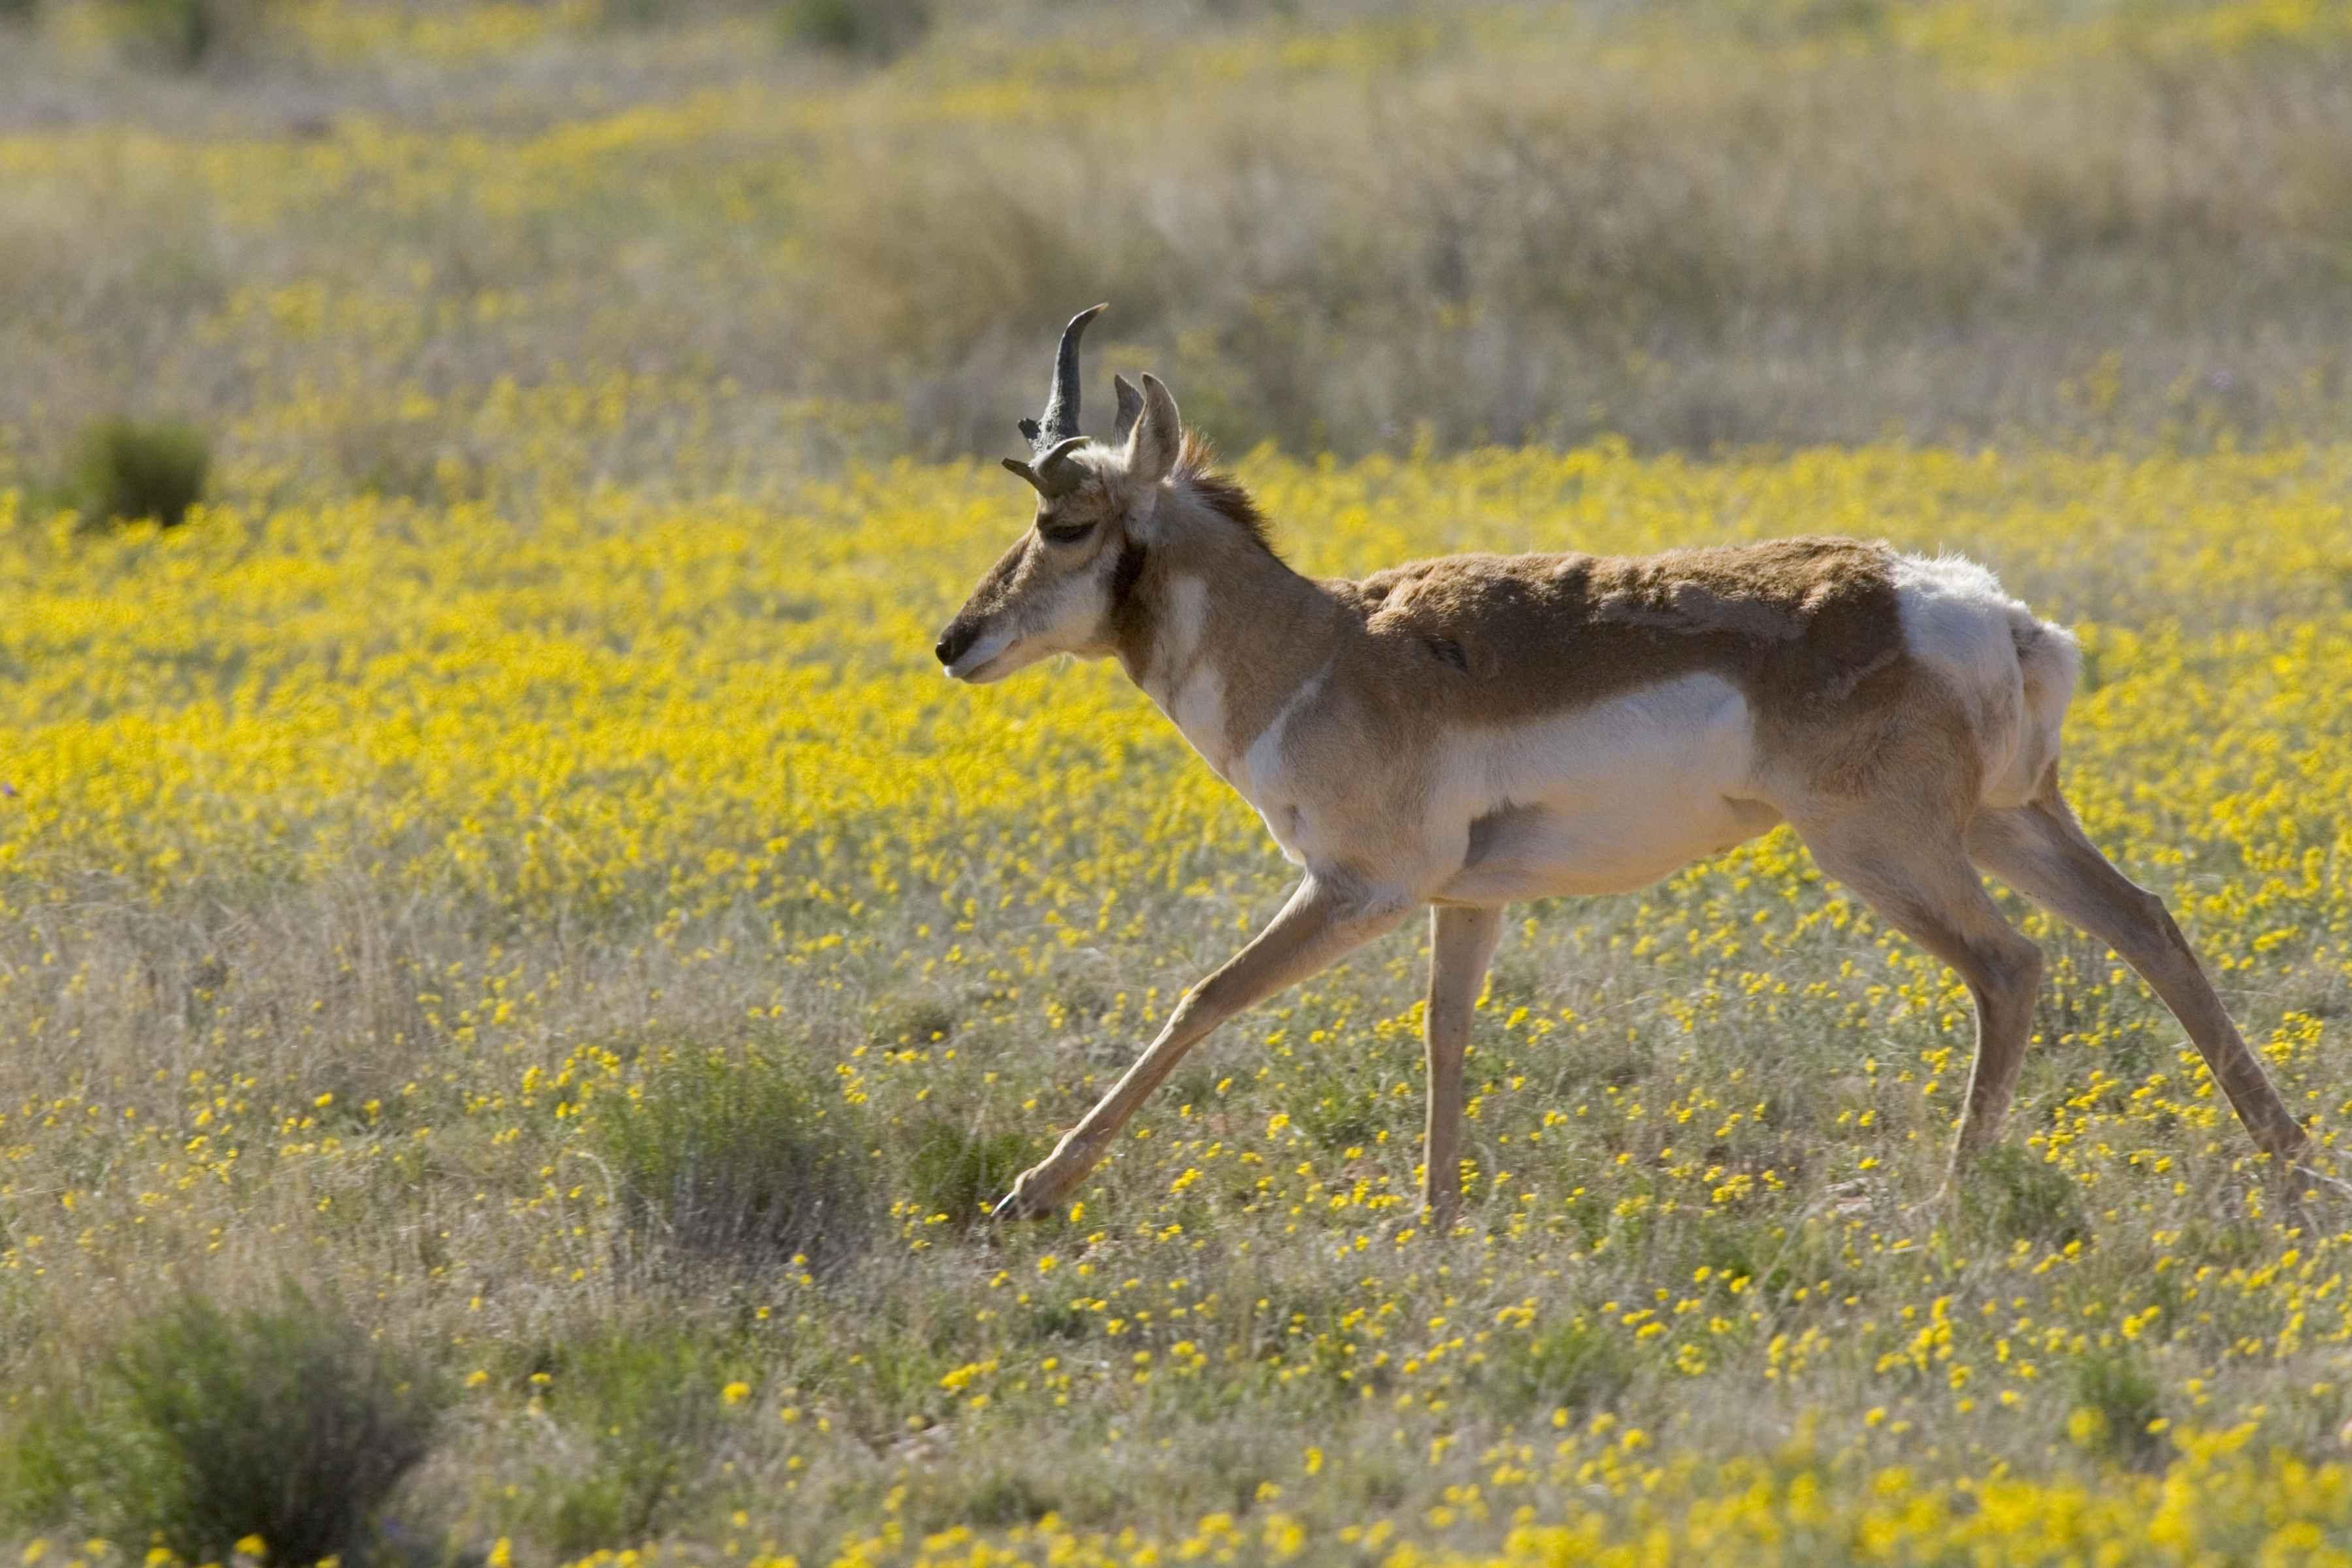 File:Pronghorn antelope runs gingerly across a meadow.jpg ...